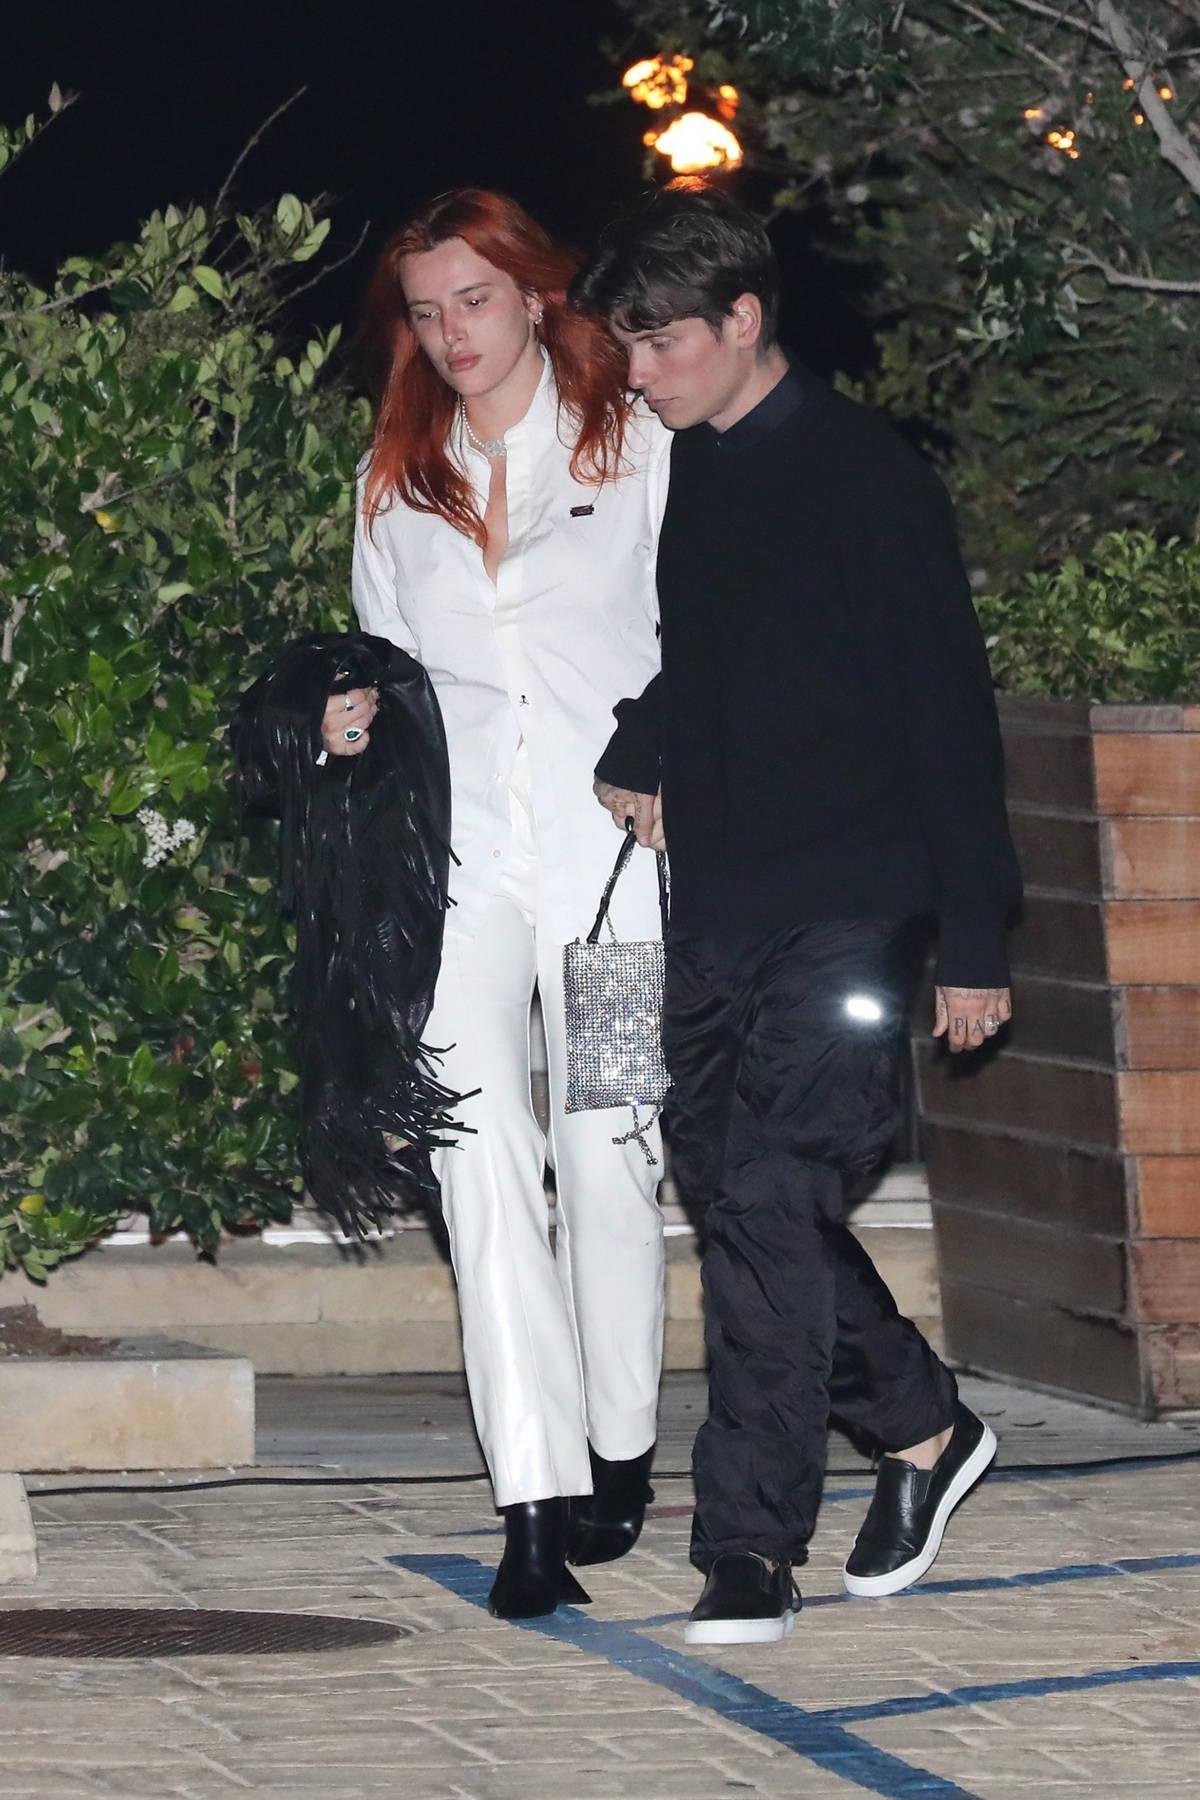 Bella Thorne and fiancé Benjamin Mascolo walk hand in hand as they leave Nobu in Malibu, California